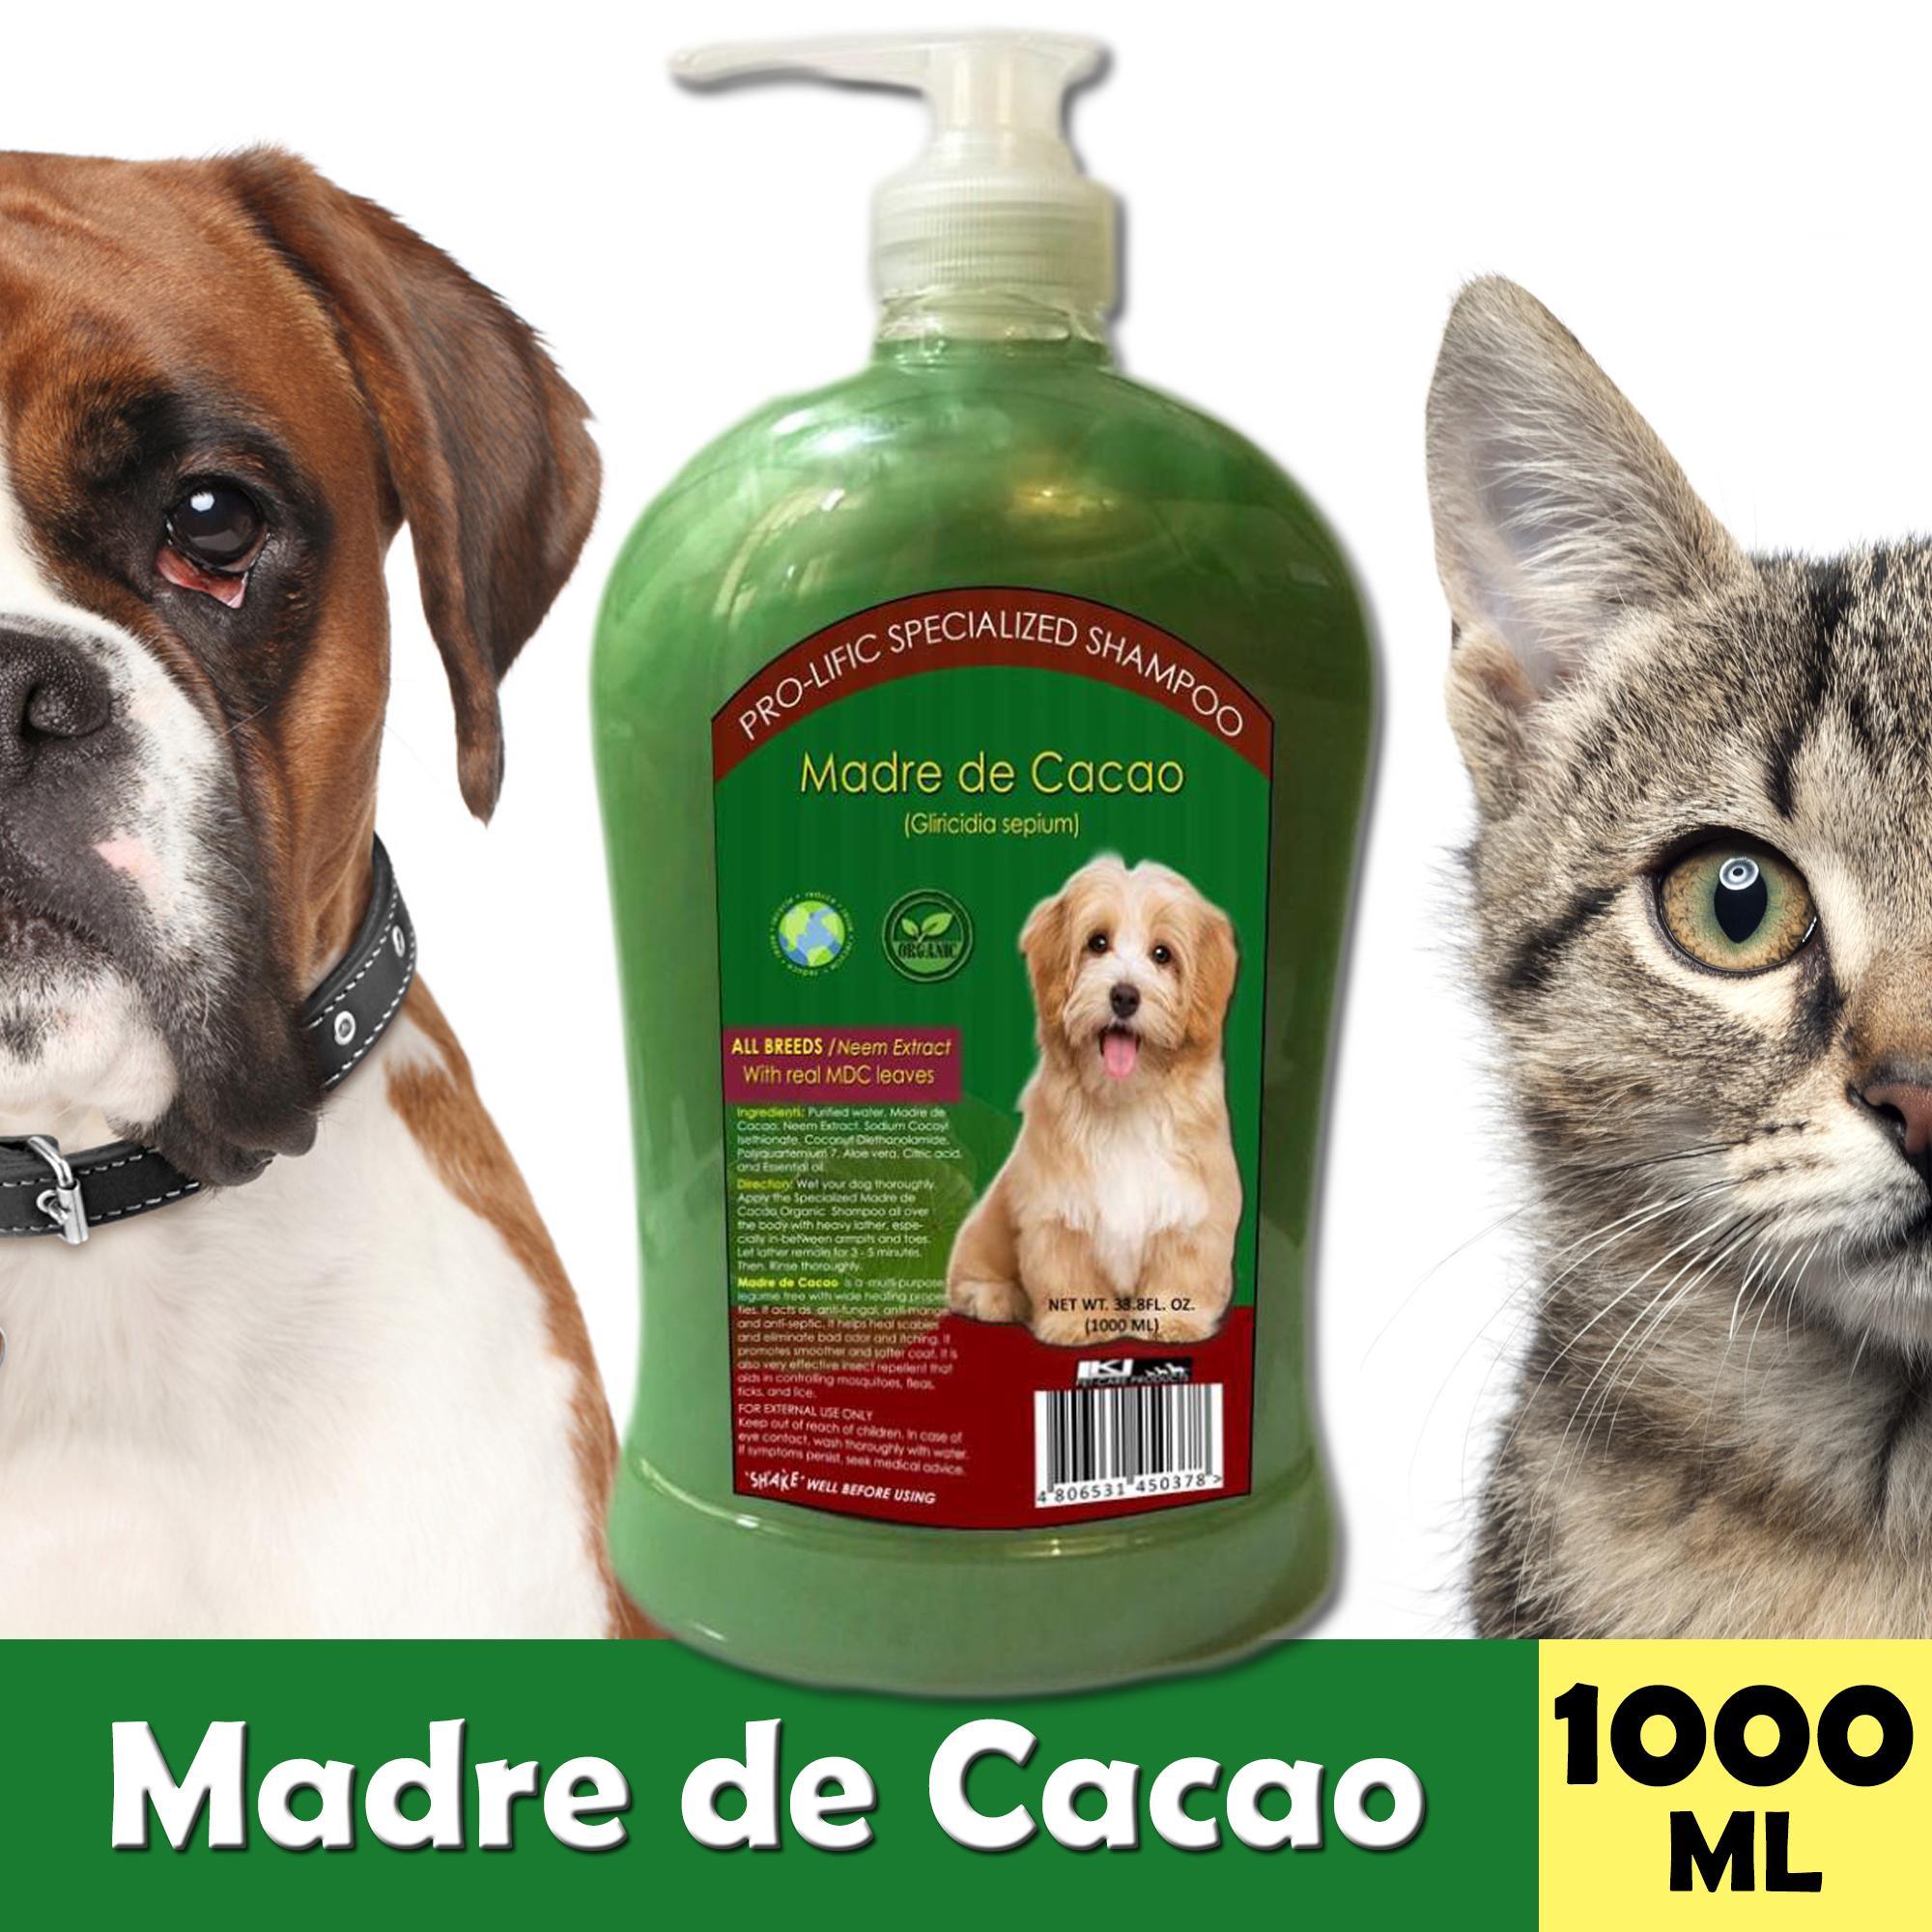 Pure Madre de Cacao 1000 mL Dog and Cat shampoo, anti mange, anti fungal,  anti itch, anti septic, with maximum healing properties